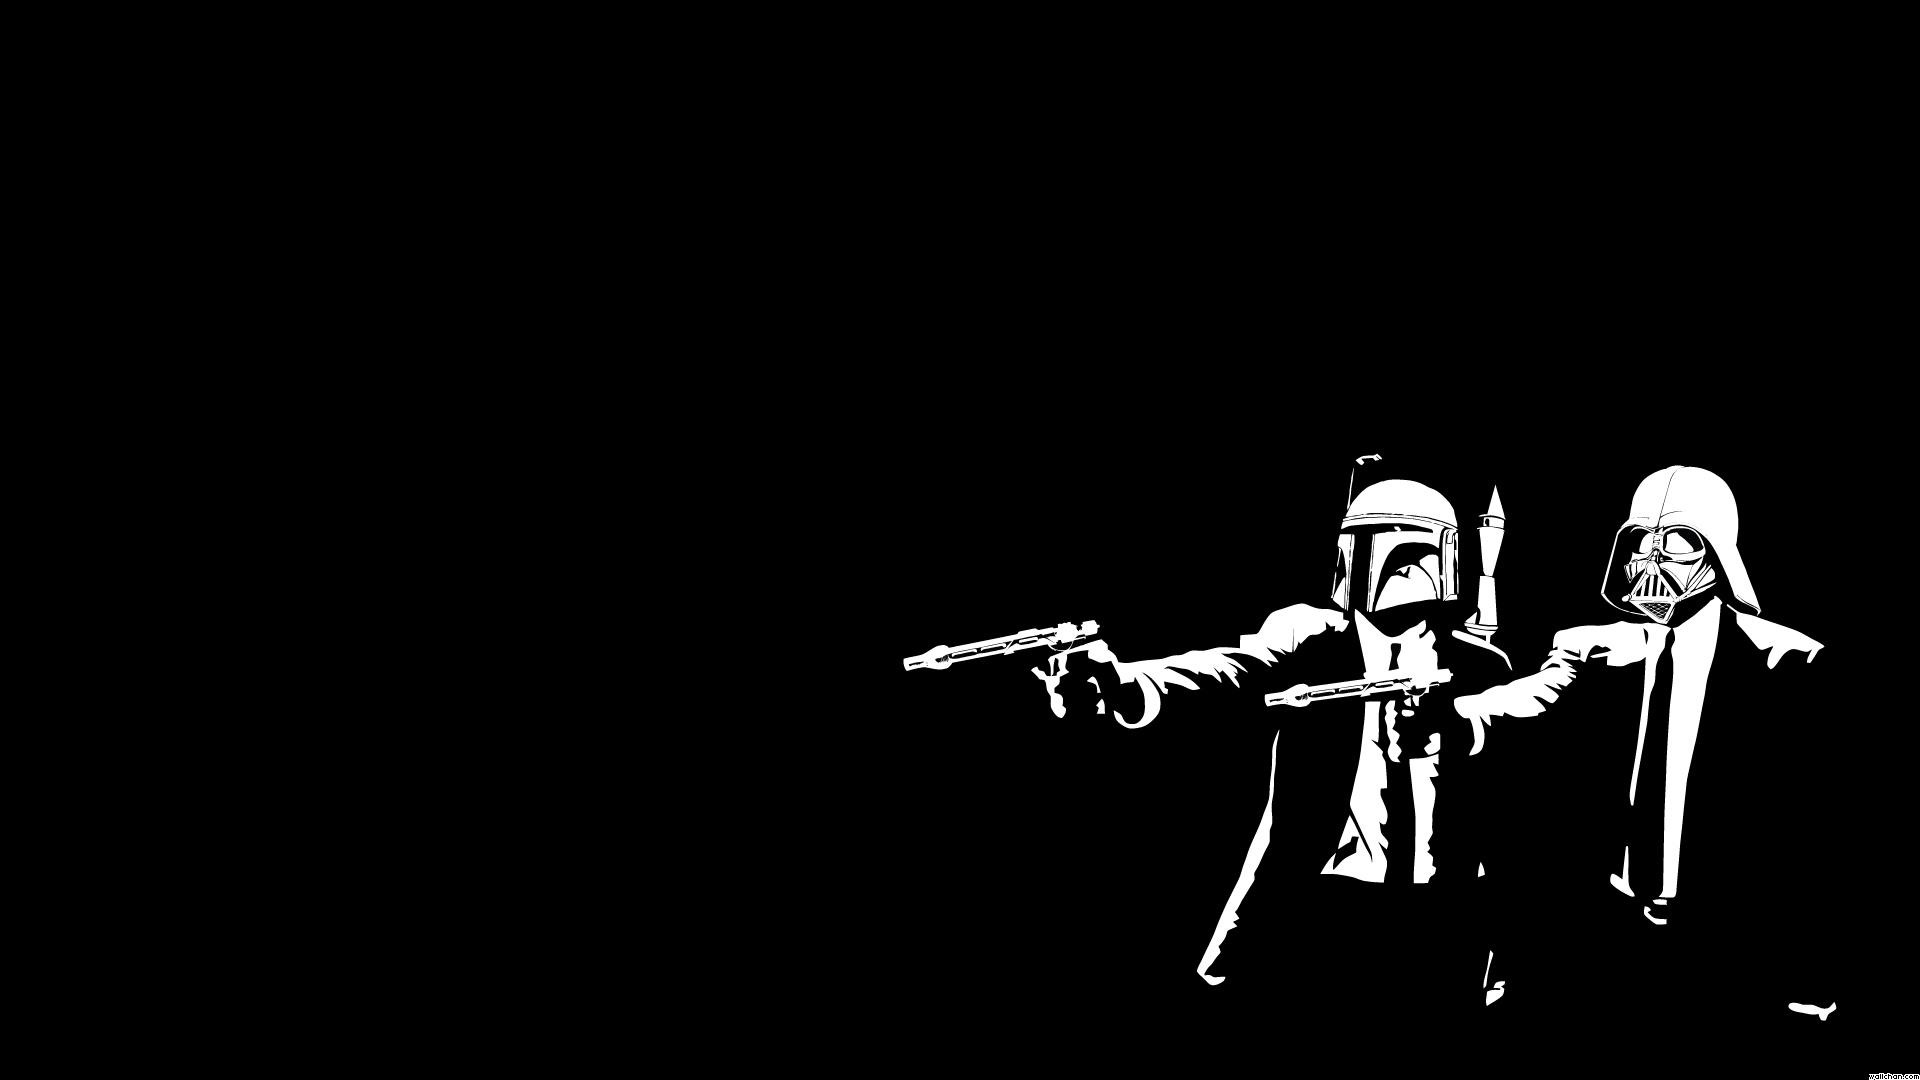 53 Star Wars 3d Background On Wallpapersafari